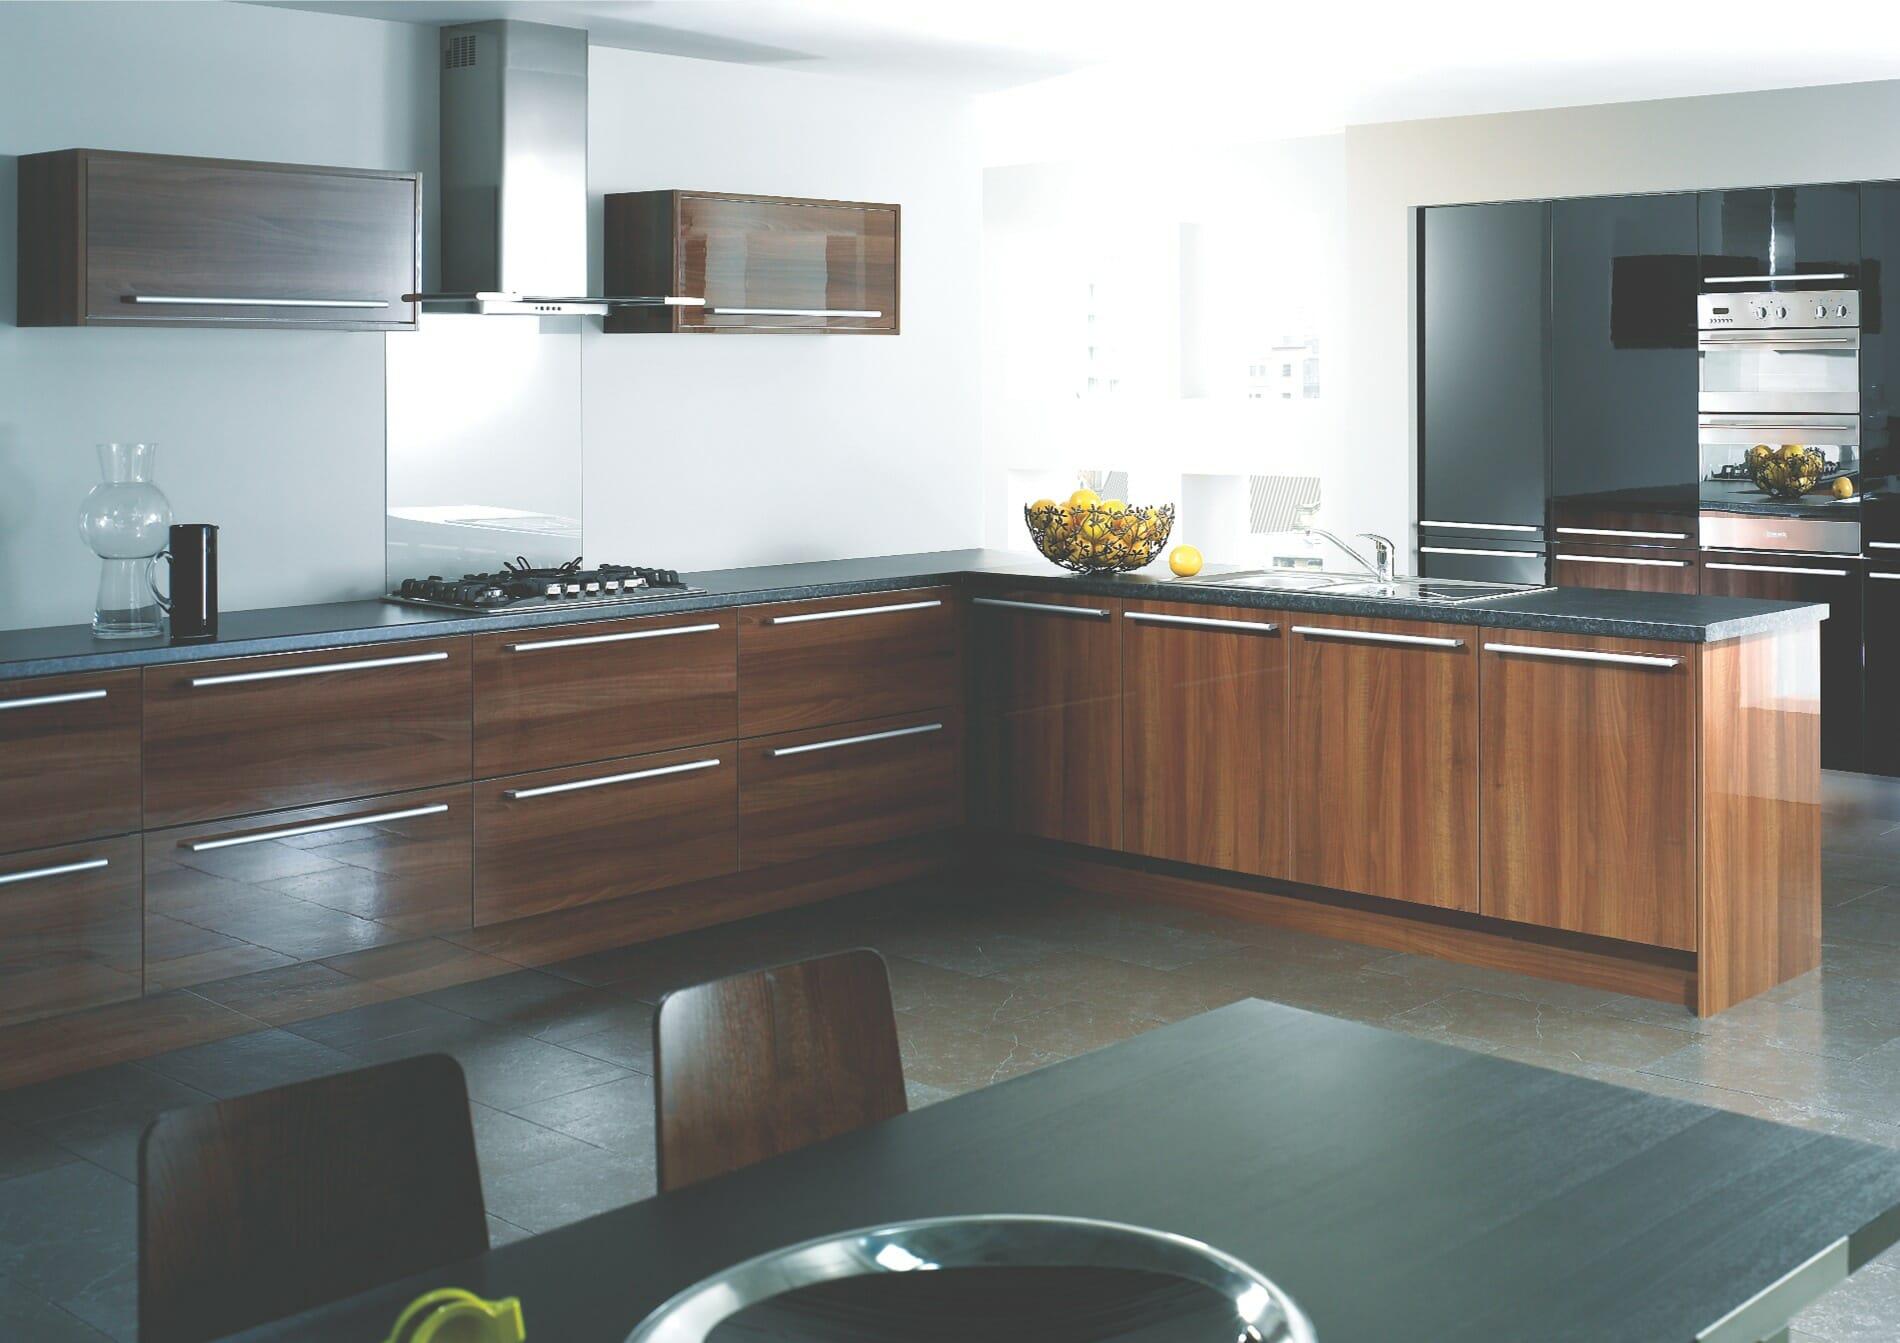 High gloss kitchens mastercraft kitchens - High Gloss Kitchens Mastercraft Kitchens Reflections Walnut Mastercraft Kitchens